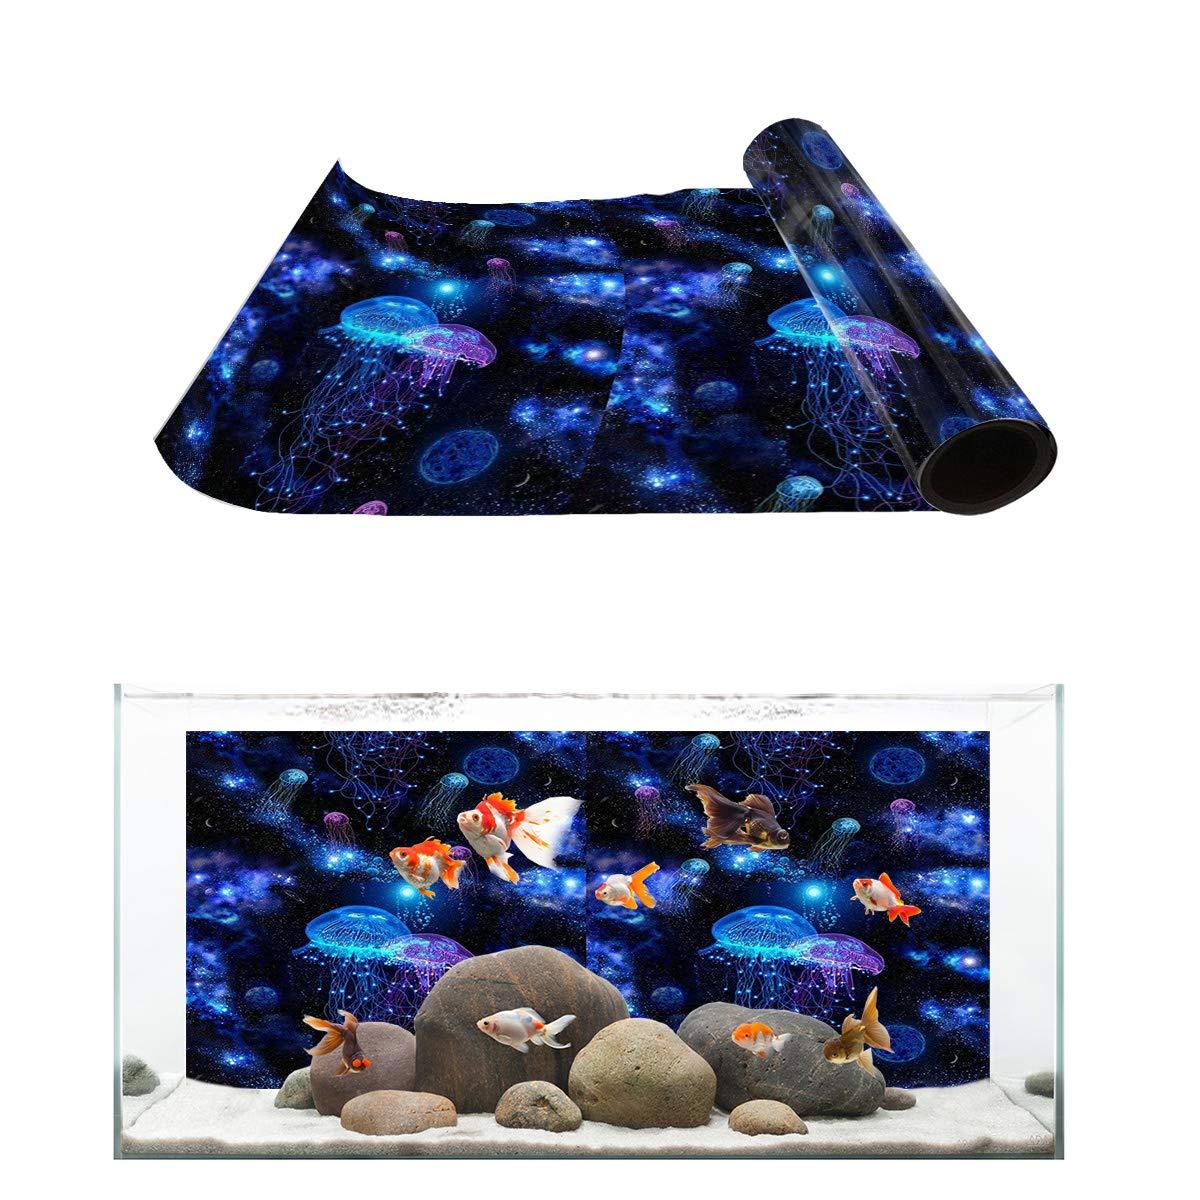 T&H Home Aquarium Décor Backgrounds - Wonderland Starry Jellyfish Fish Tank Background Aquarium Sticker Wallpaper Decoration Picture PVC Adhesive Poster, 48.8'' W x 18.4'' H by T&H Home